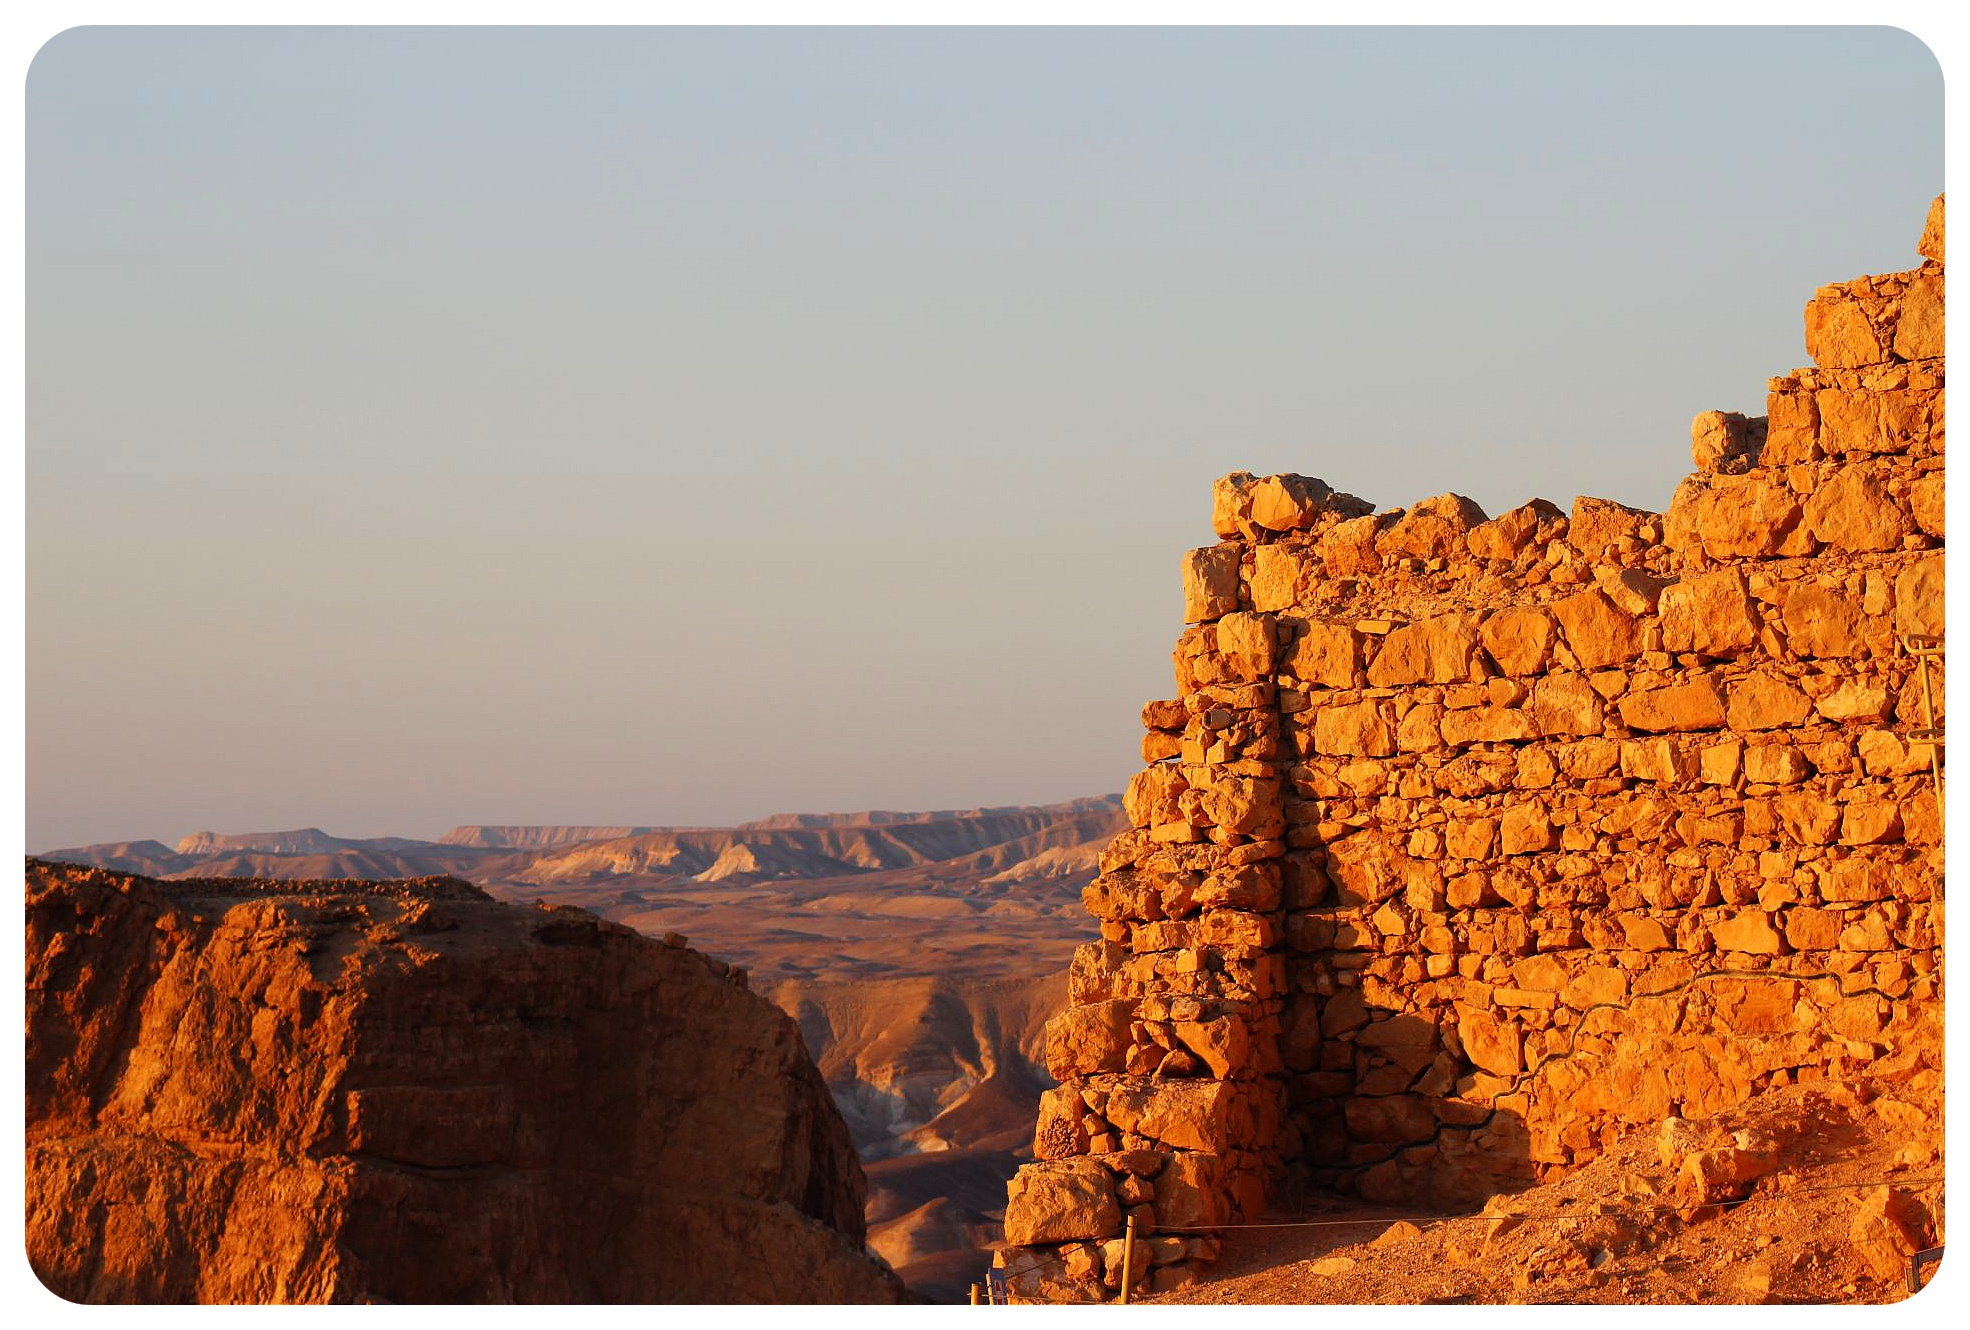 masada israel and judean desert